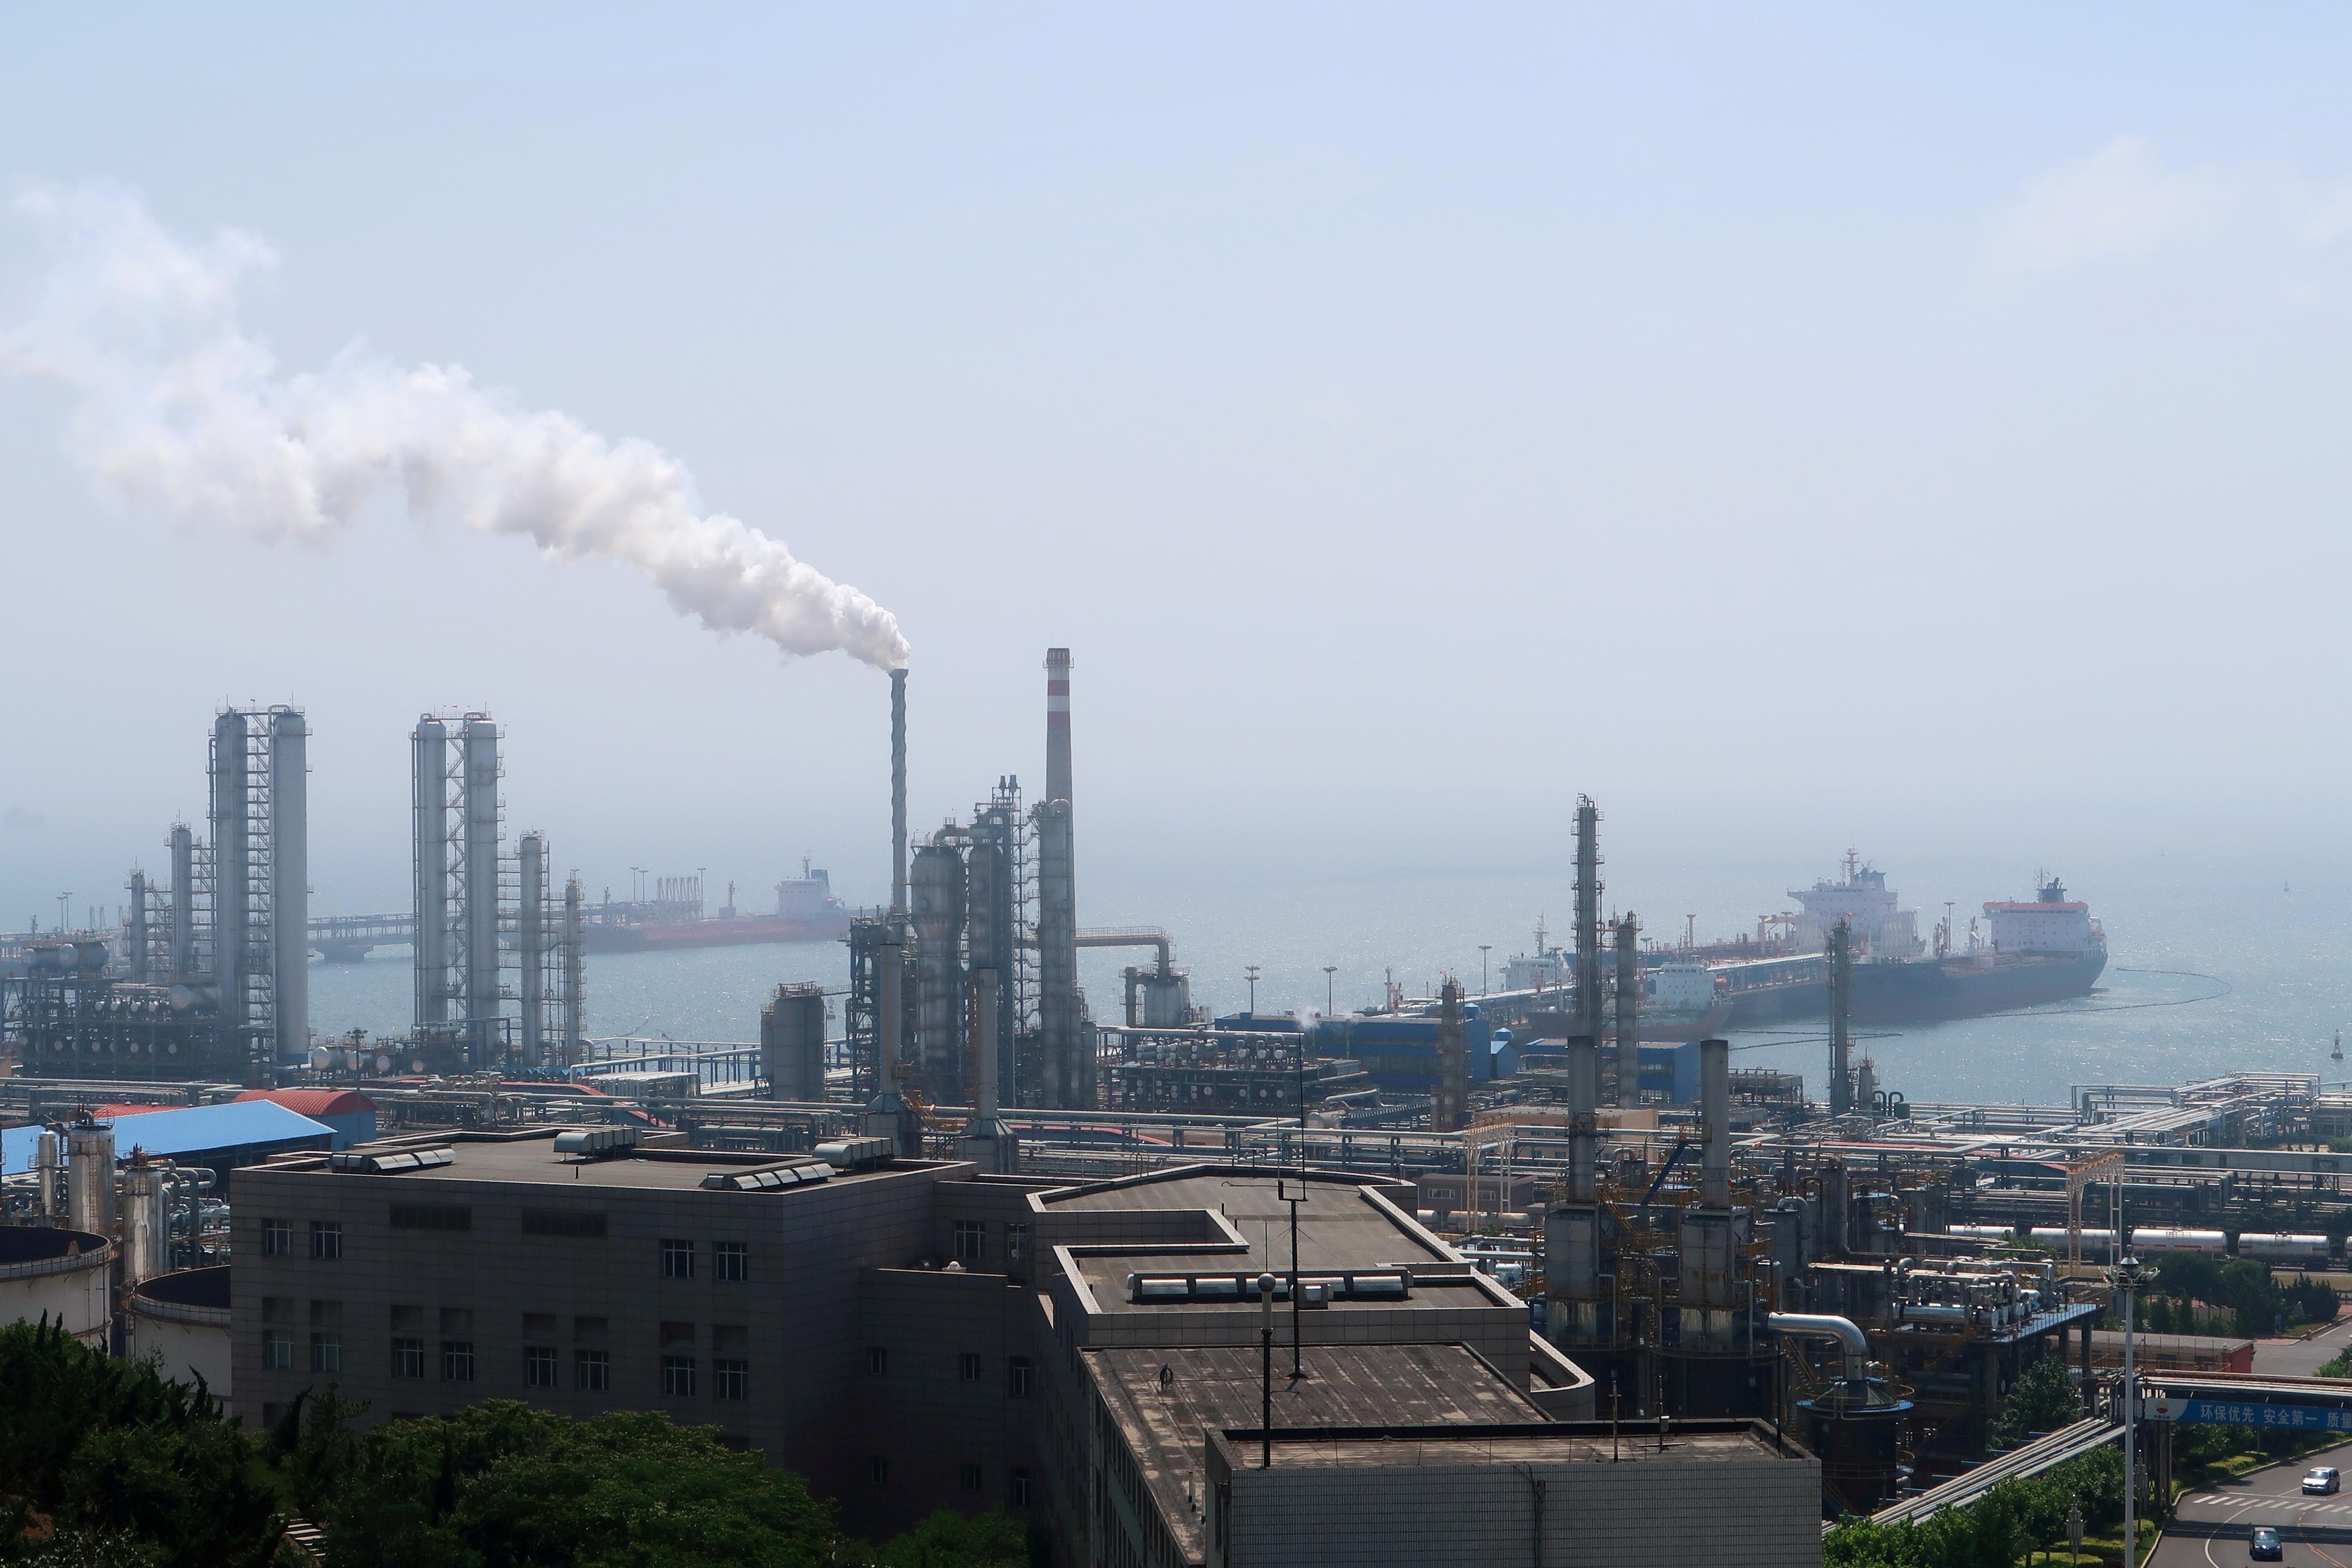 China National Petroleum Corporation (CNPC)'s Dalian Petrochemical Corp refinery is seen near the downtown of Dalian in Liaoning province, China July 17, 2018.  REUTERS/Chen Aizhu//File Photo